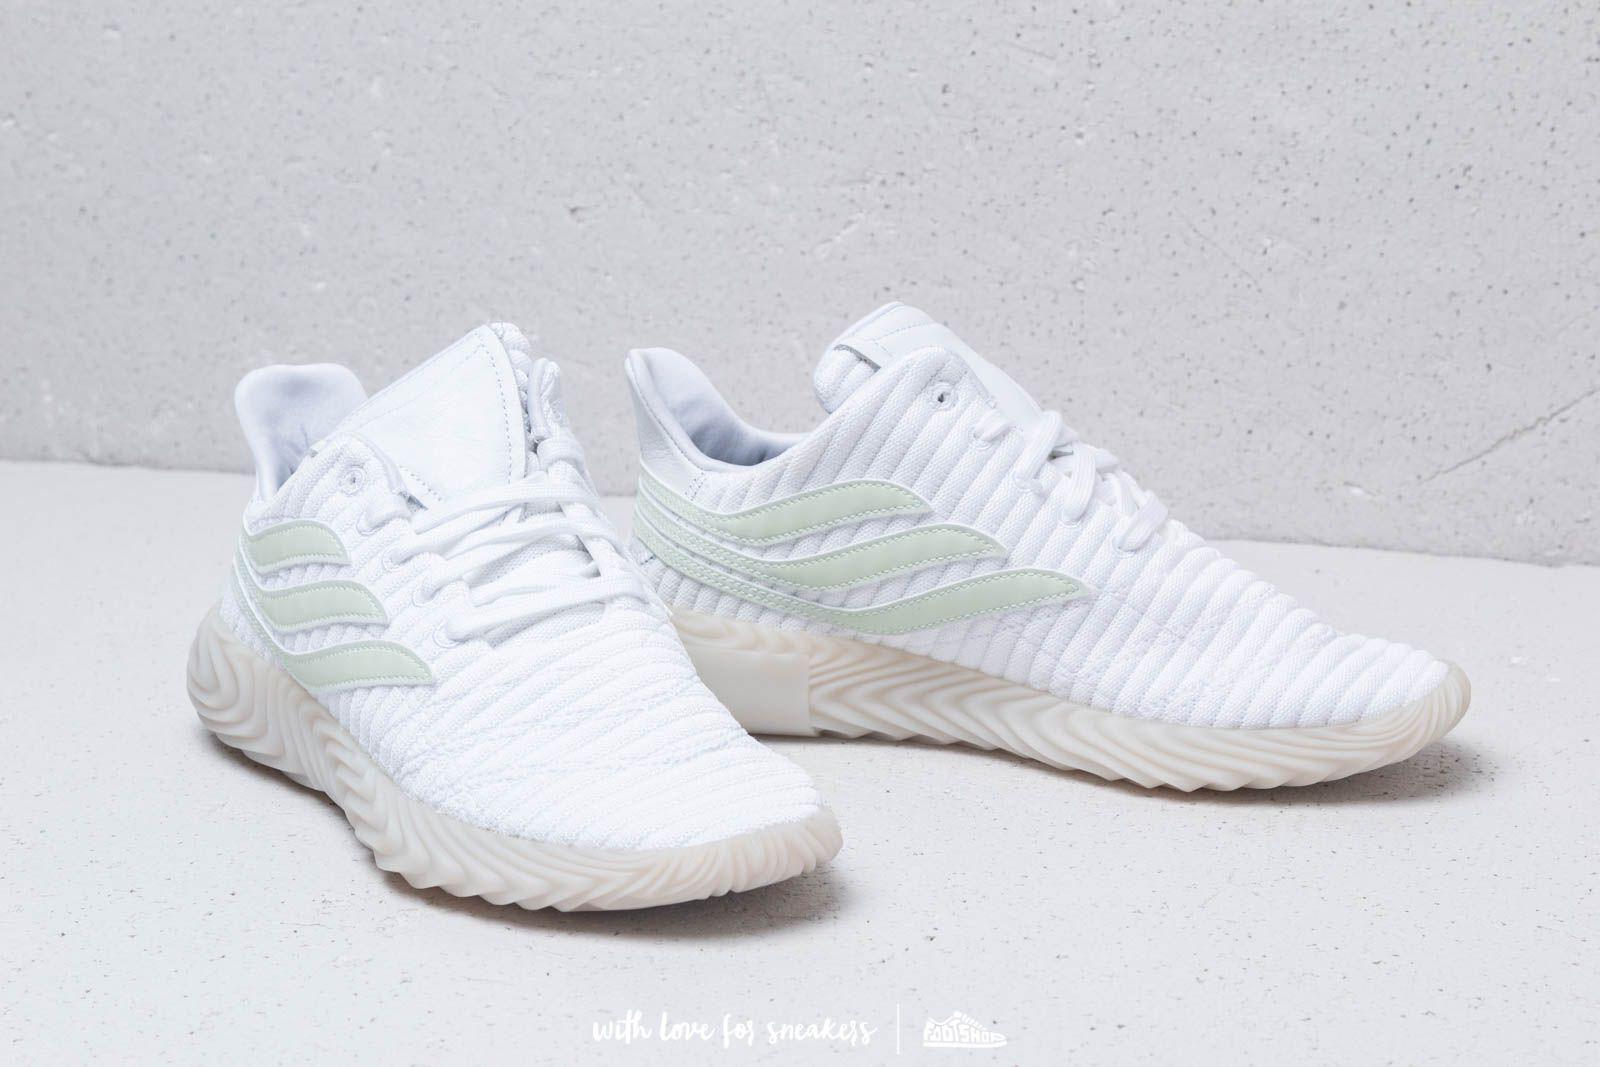 official photos 391b5 7cd37 Adidas Originals - Adidas Sobakov Ftw White Aero Green Crystal White for  Men -. View fullscreen